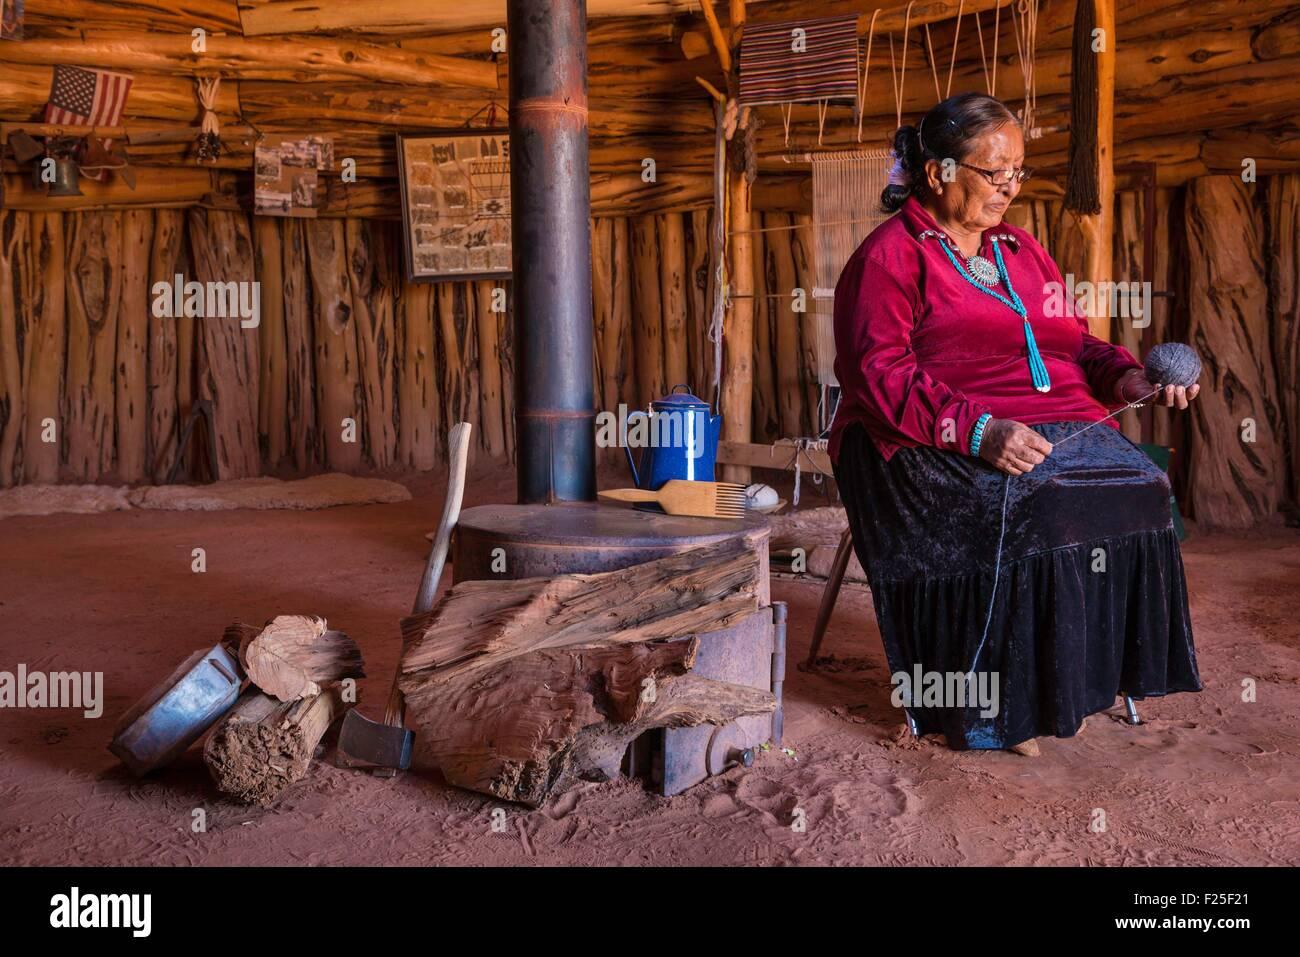 United States, Arizona, Navajo Nation, Monument Valley Tribal Park, hogan (traditional navajo house) - Stock Image